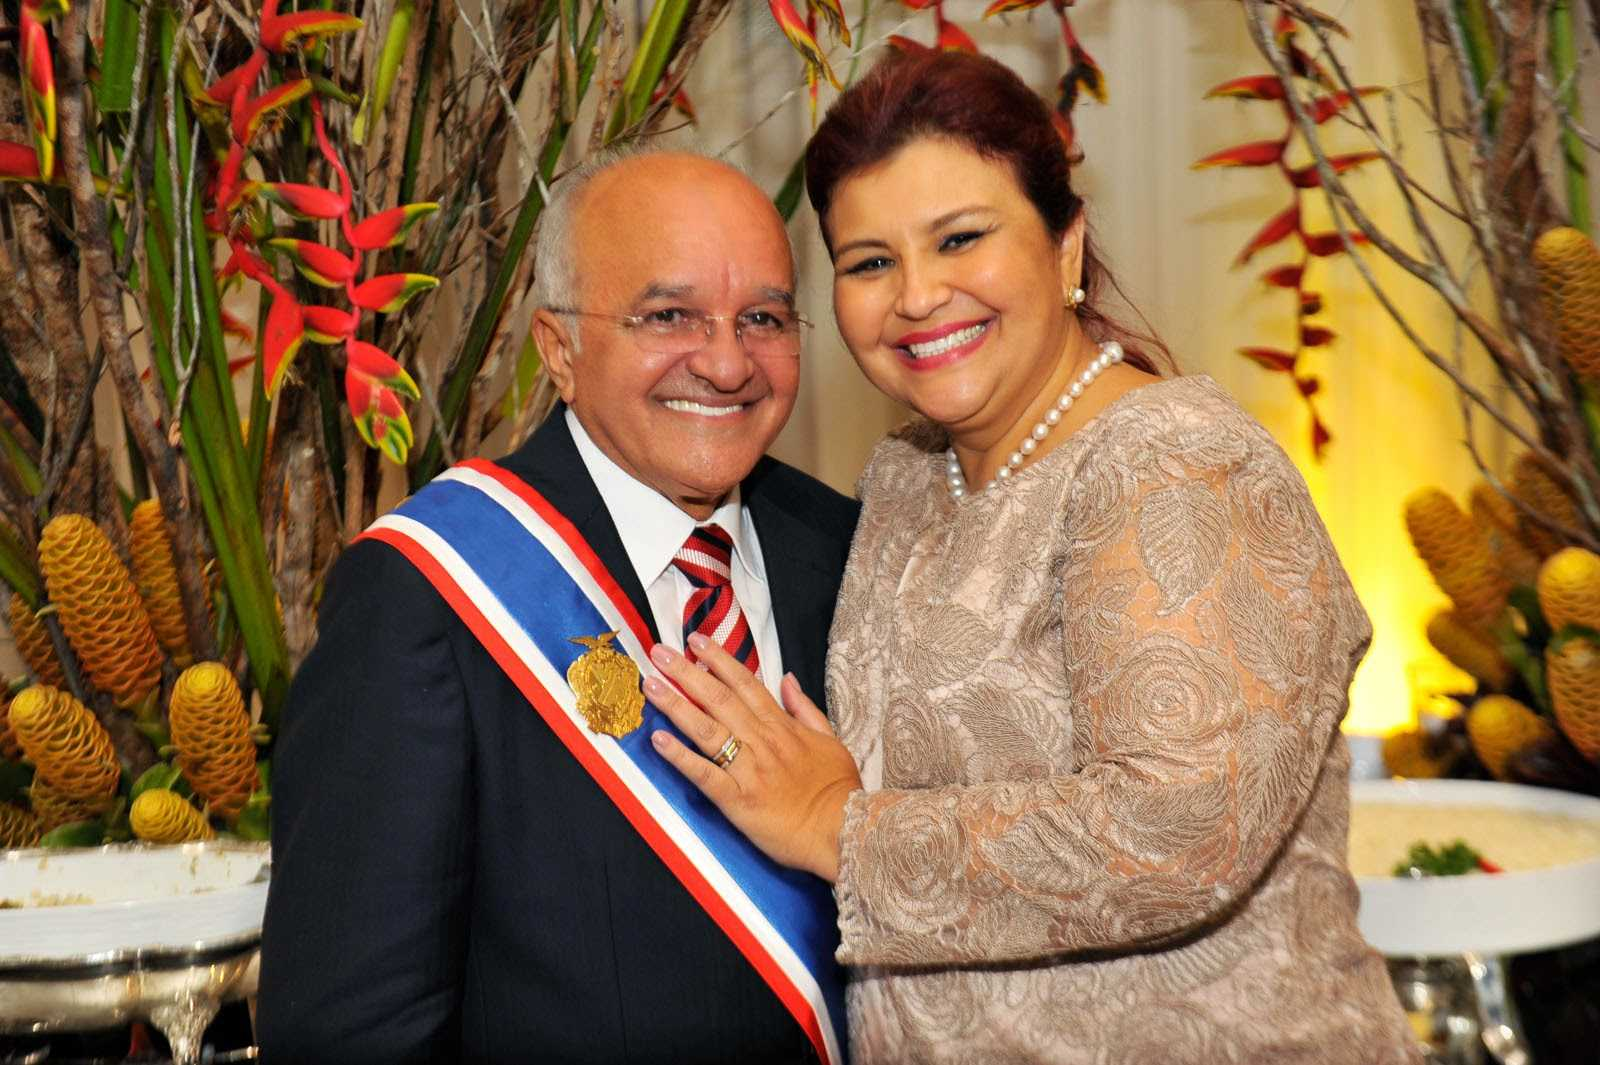 José Melo e a esposa Edilene Gomes / Foto: Alfredo Fernandes